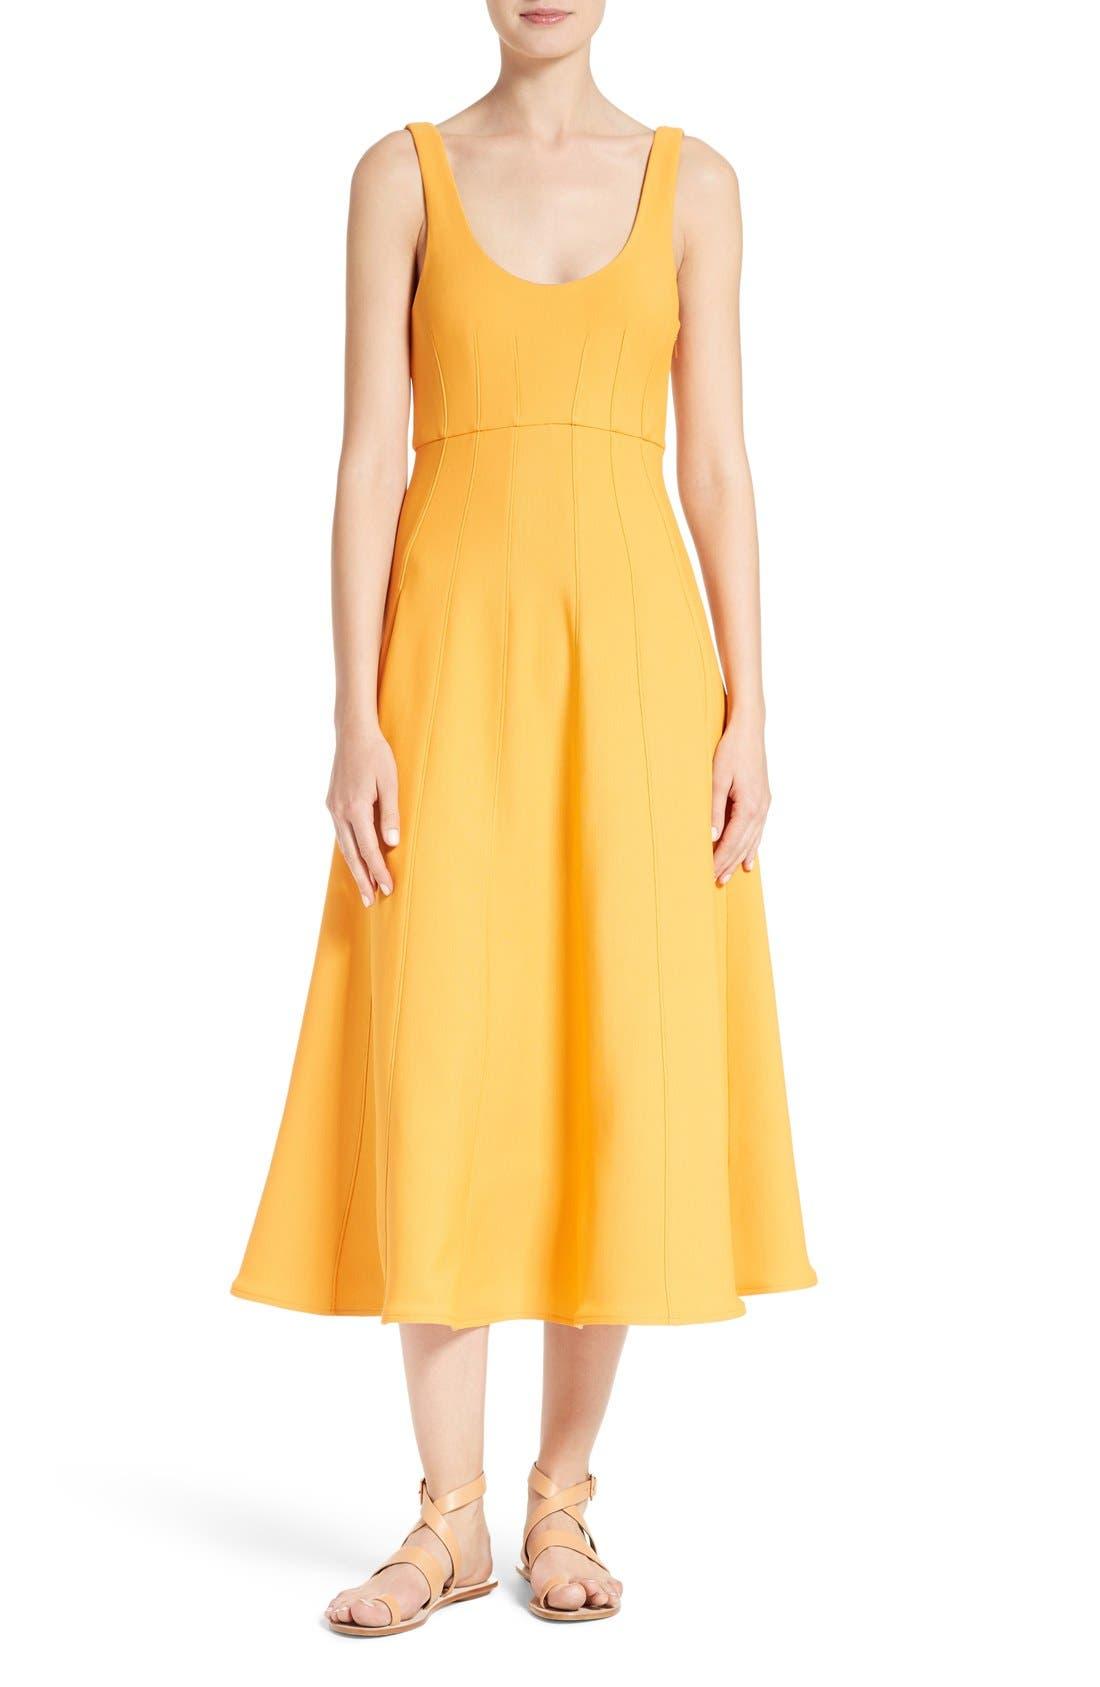 Alternate Image 1 Selected - Tibi Corset Structured Midi Dress